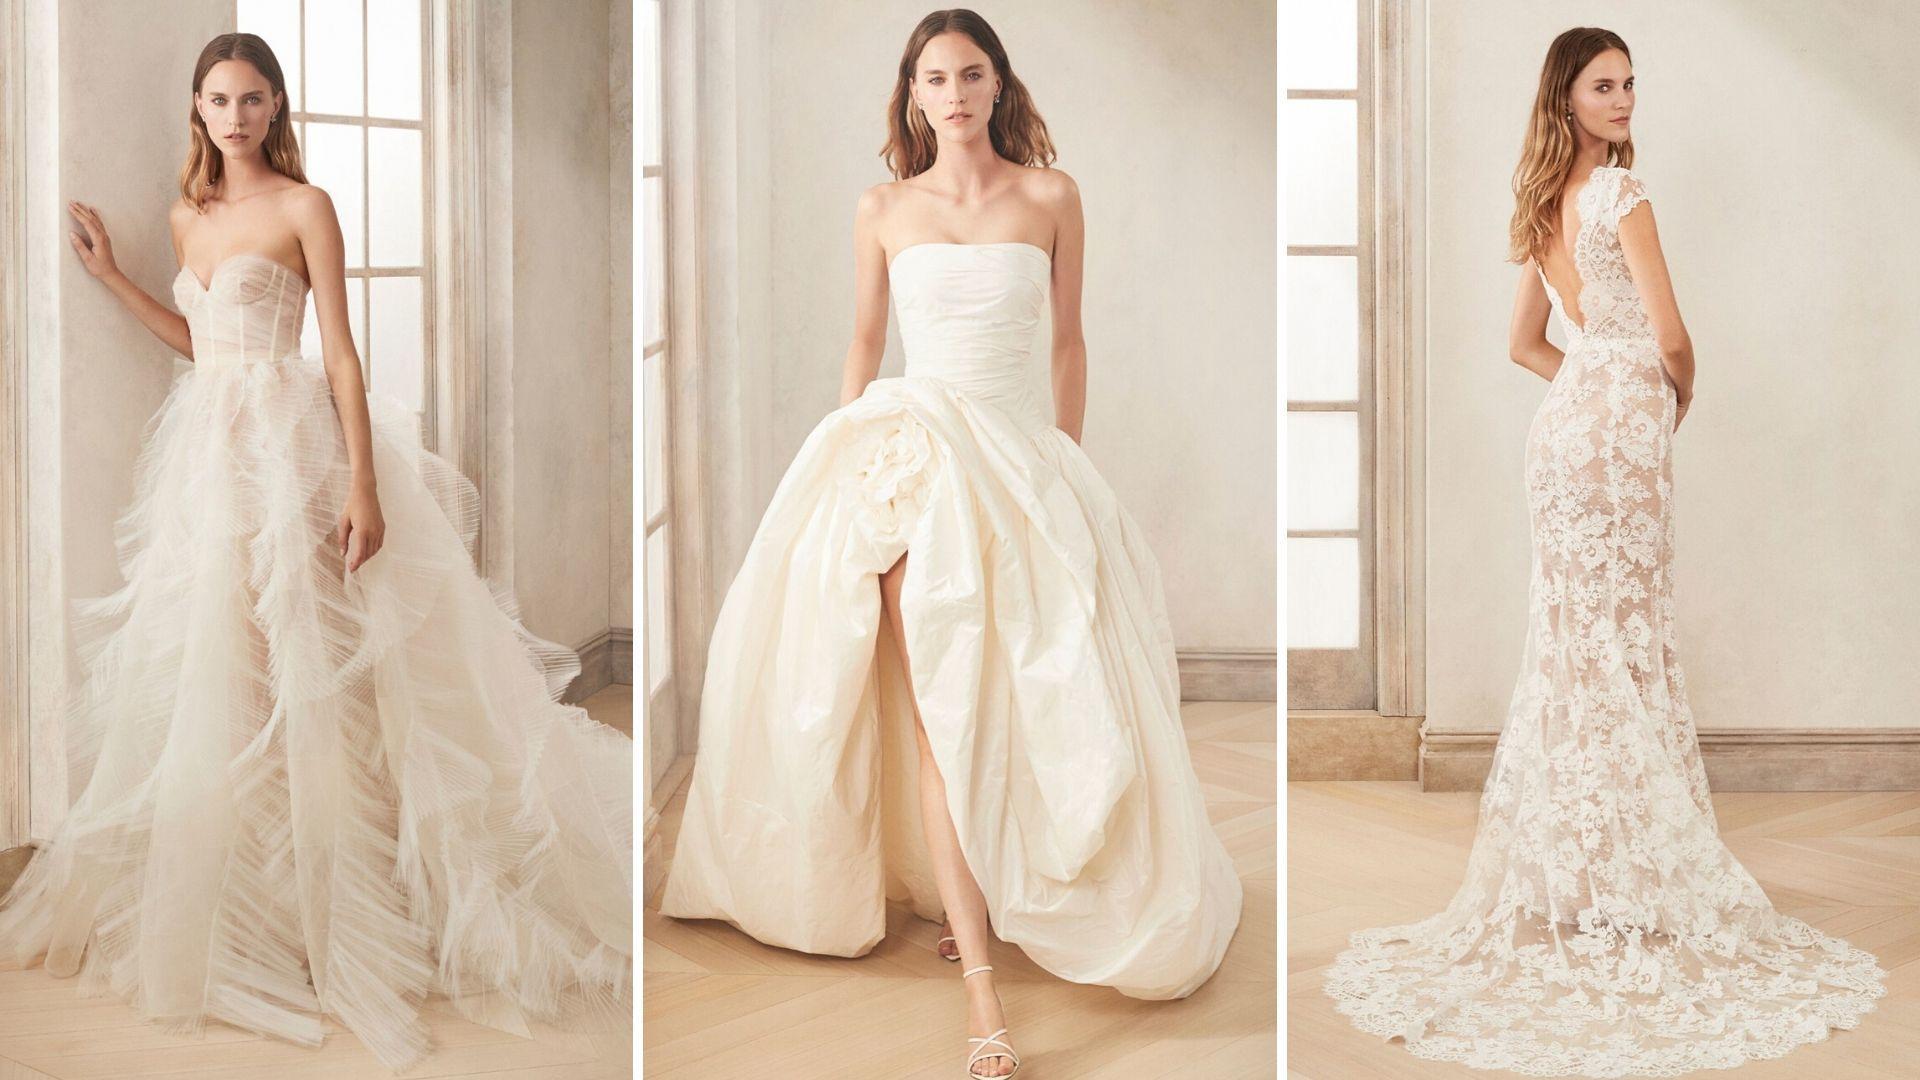 Oscar De La Renta's Autumn 2020 Bridal Collection Is A Sartorial Dream Come True